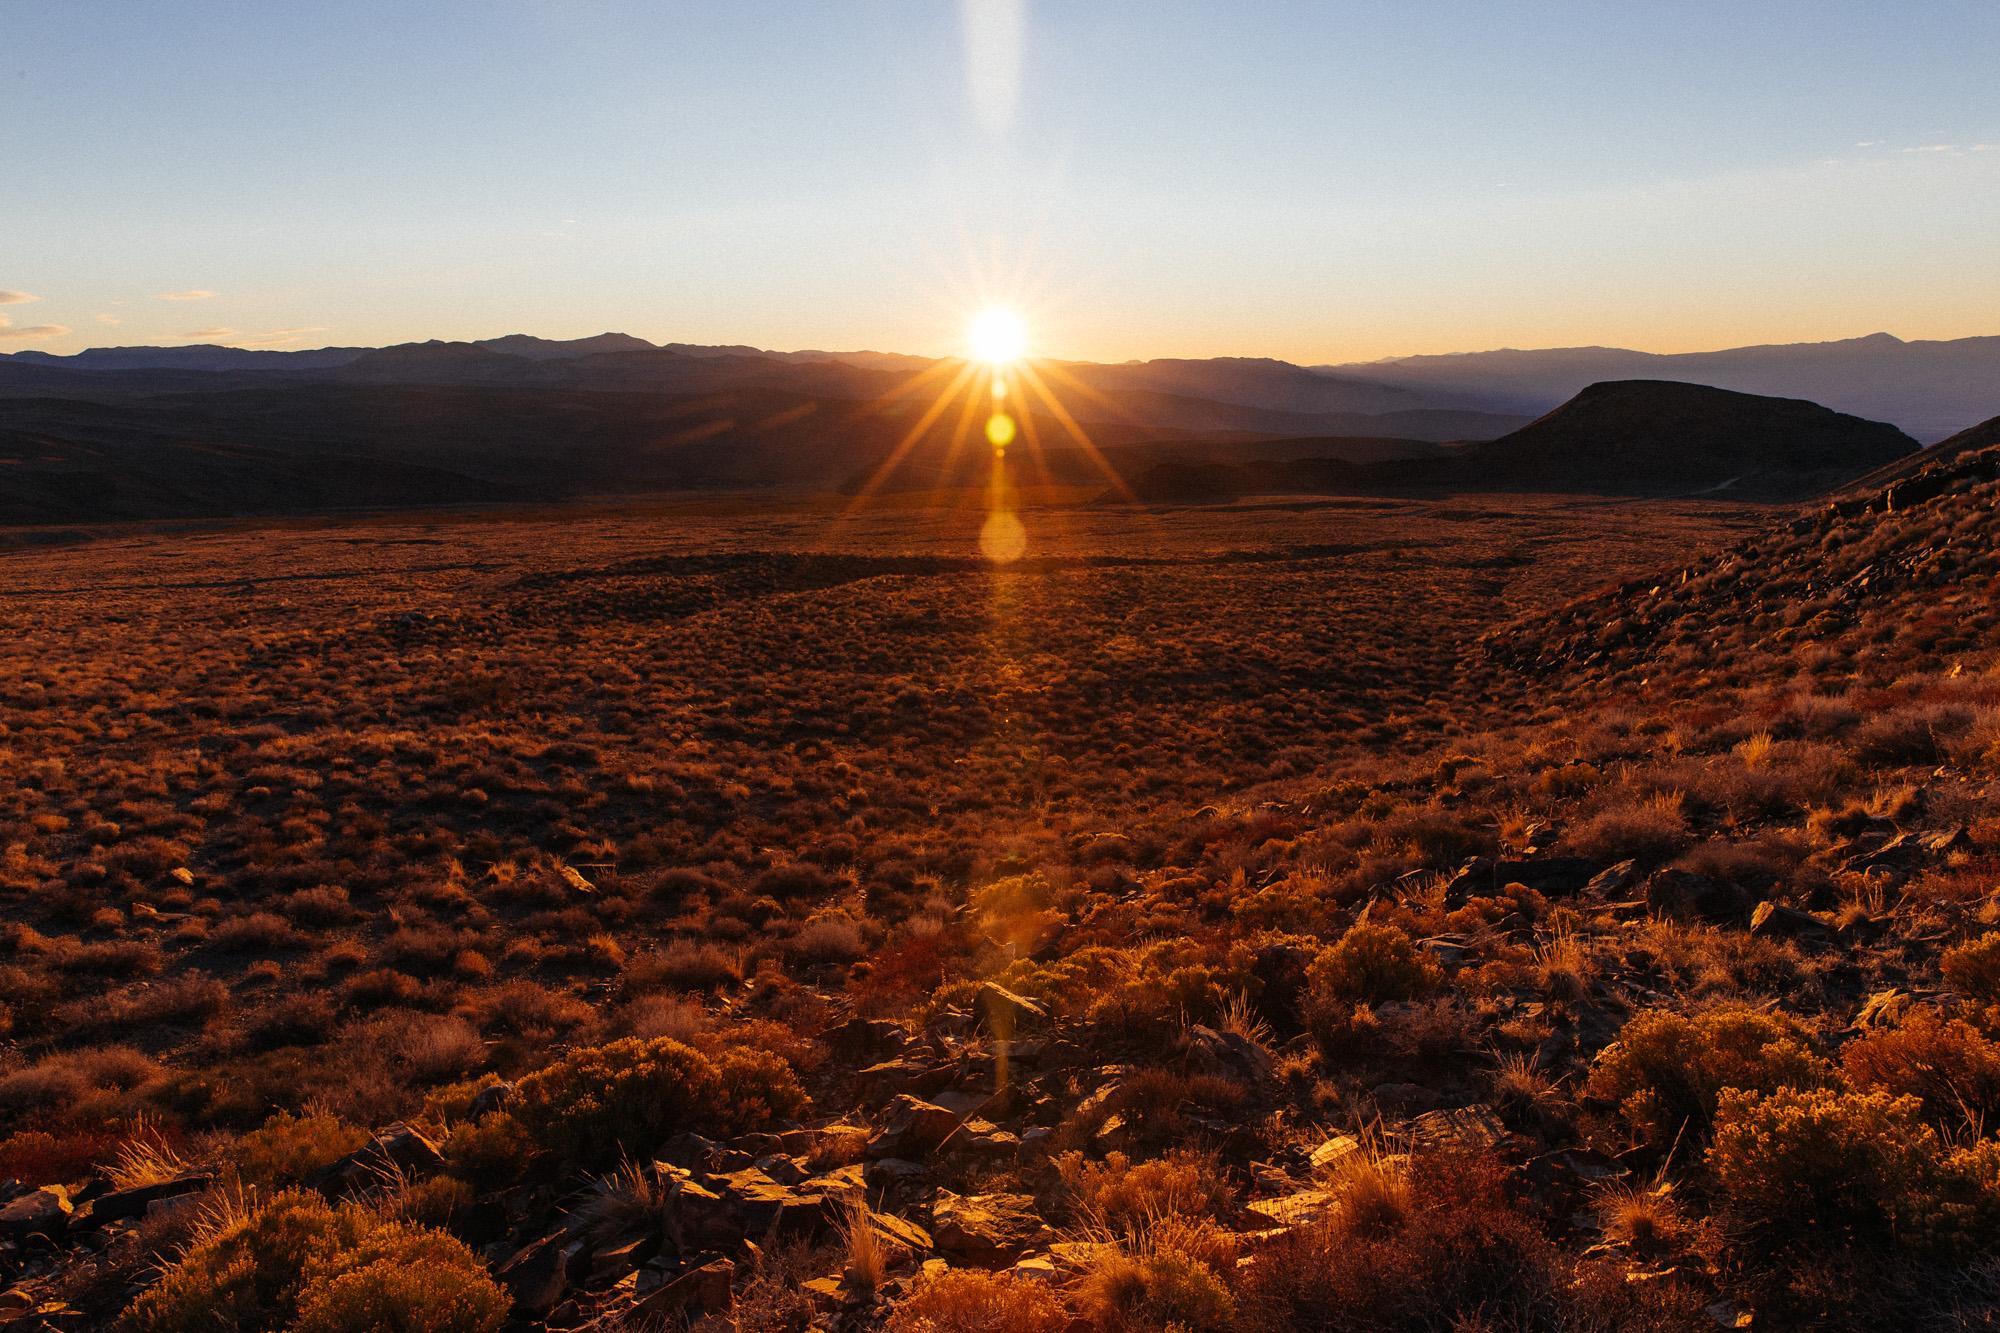 When the sun cracks, the desert stands still.